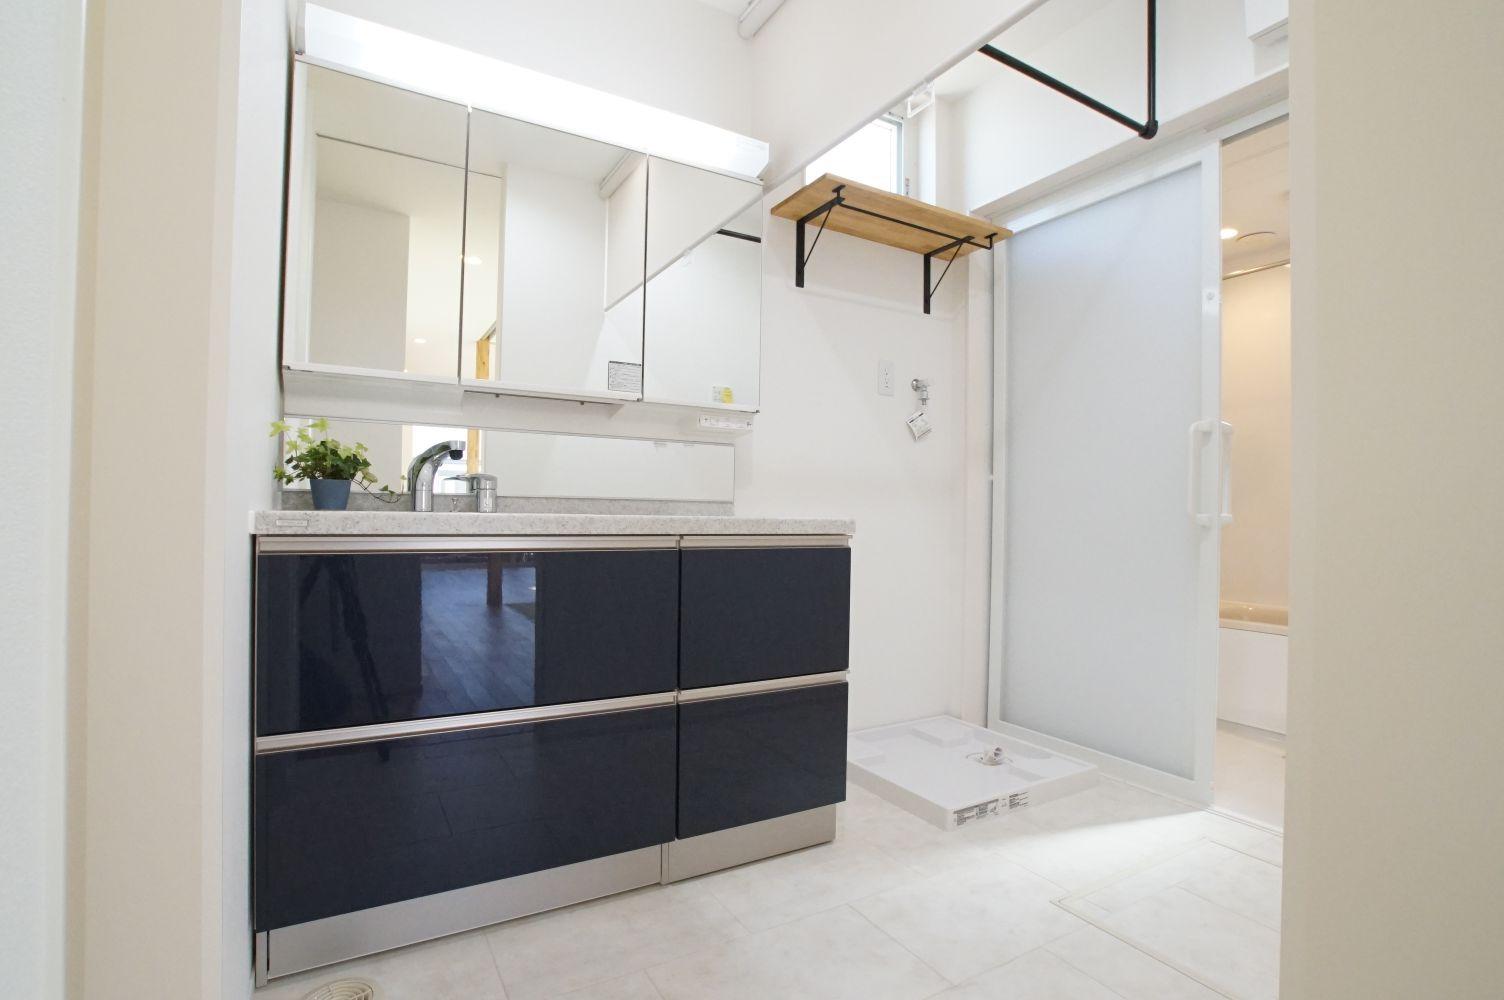 RIKYU (リキュー)【デザイン住宅、省エネ、インテリア】洗面所はネイビーでシックな仕上げ